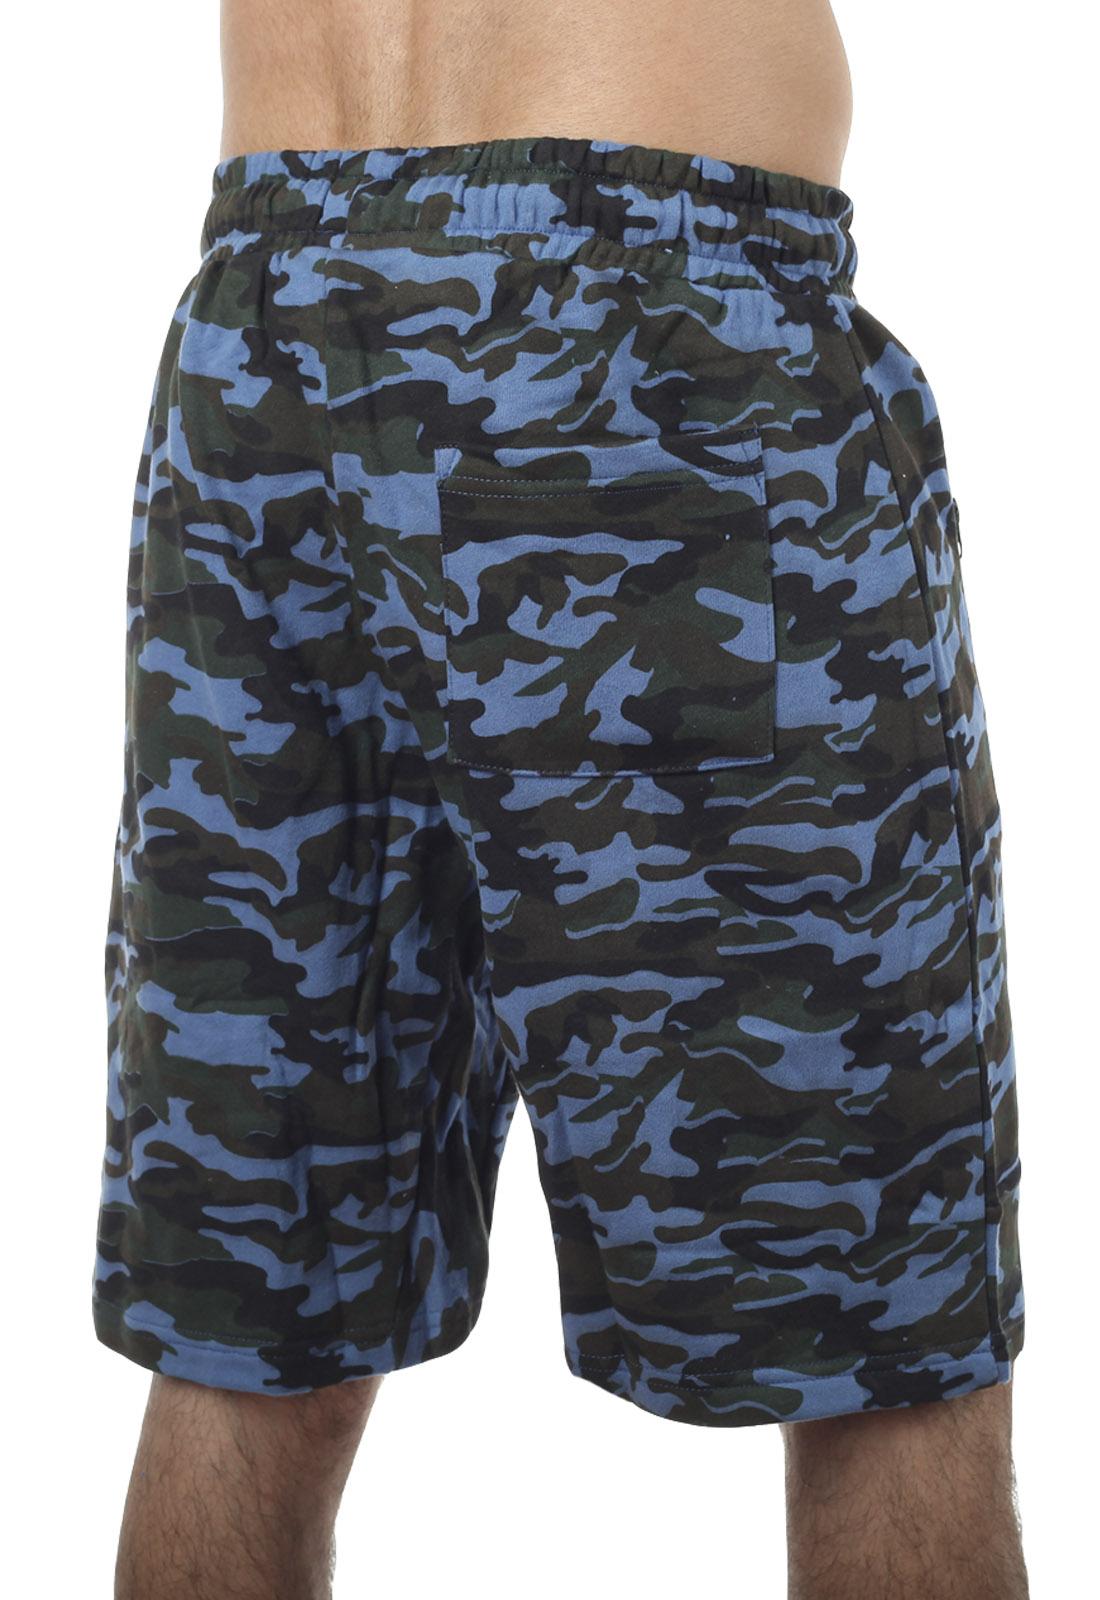 Мужские армейские шорты от New York Athletics.